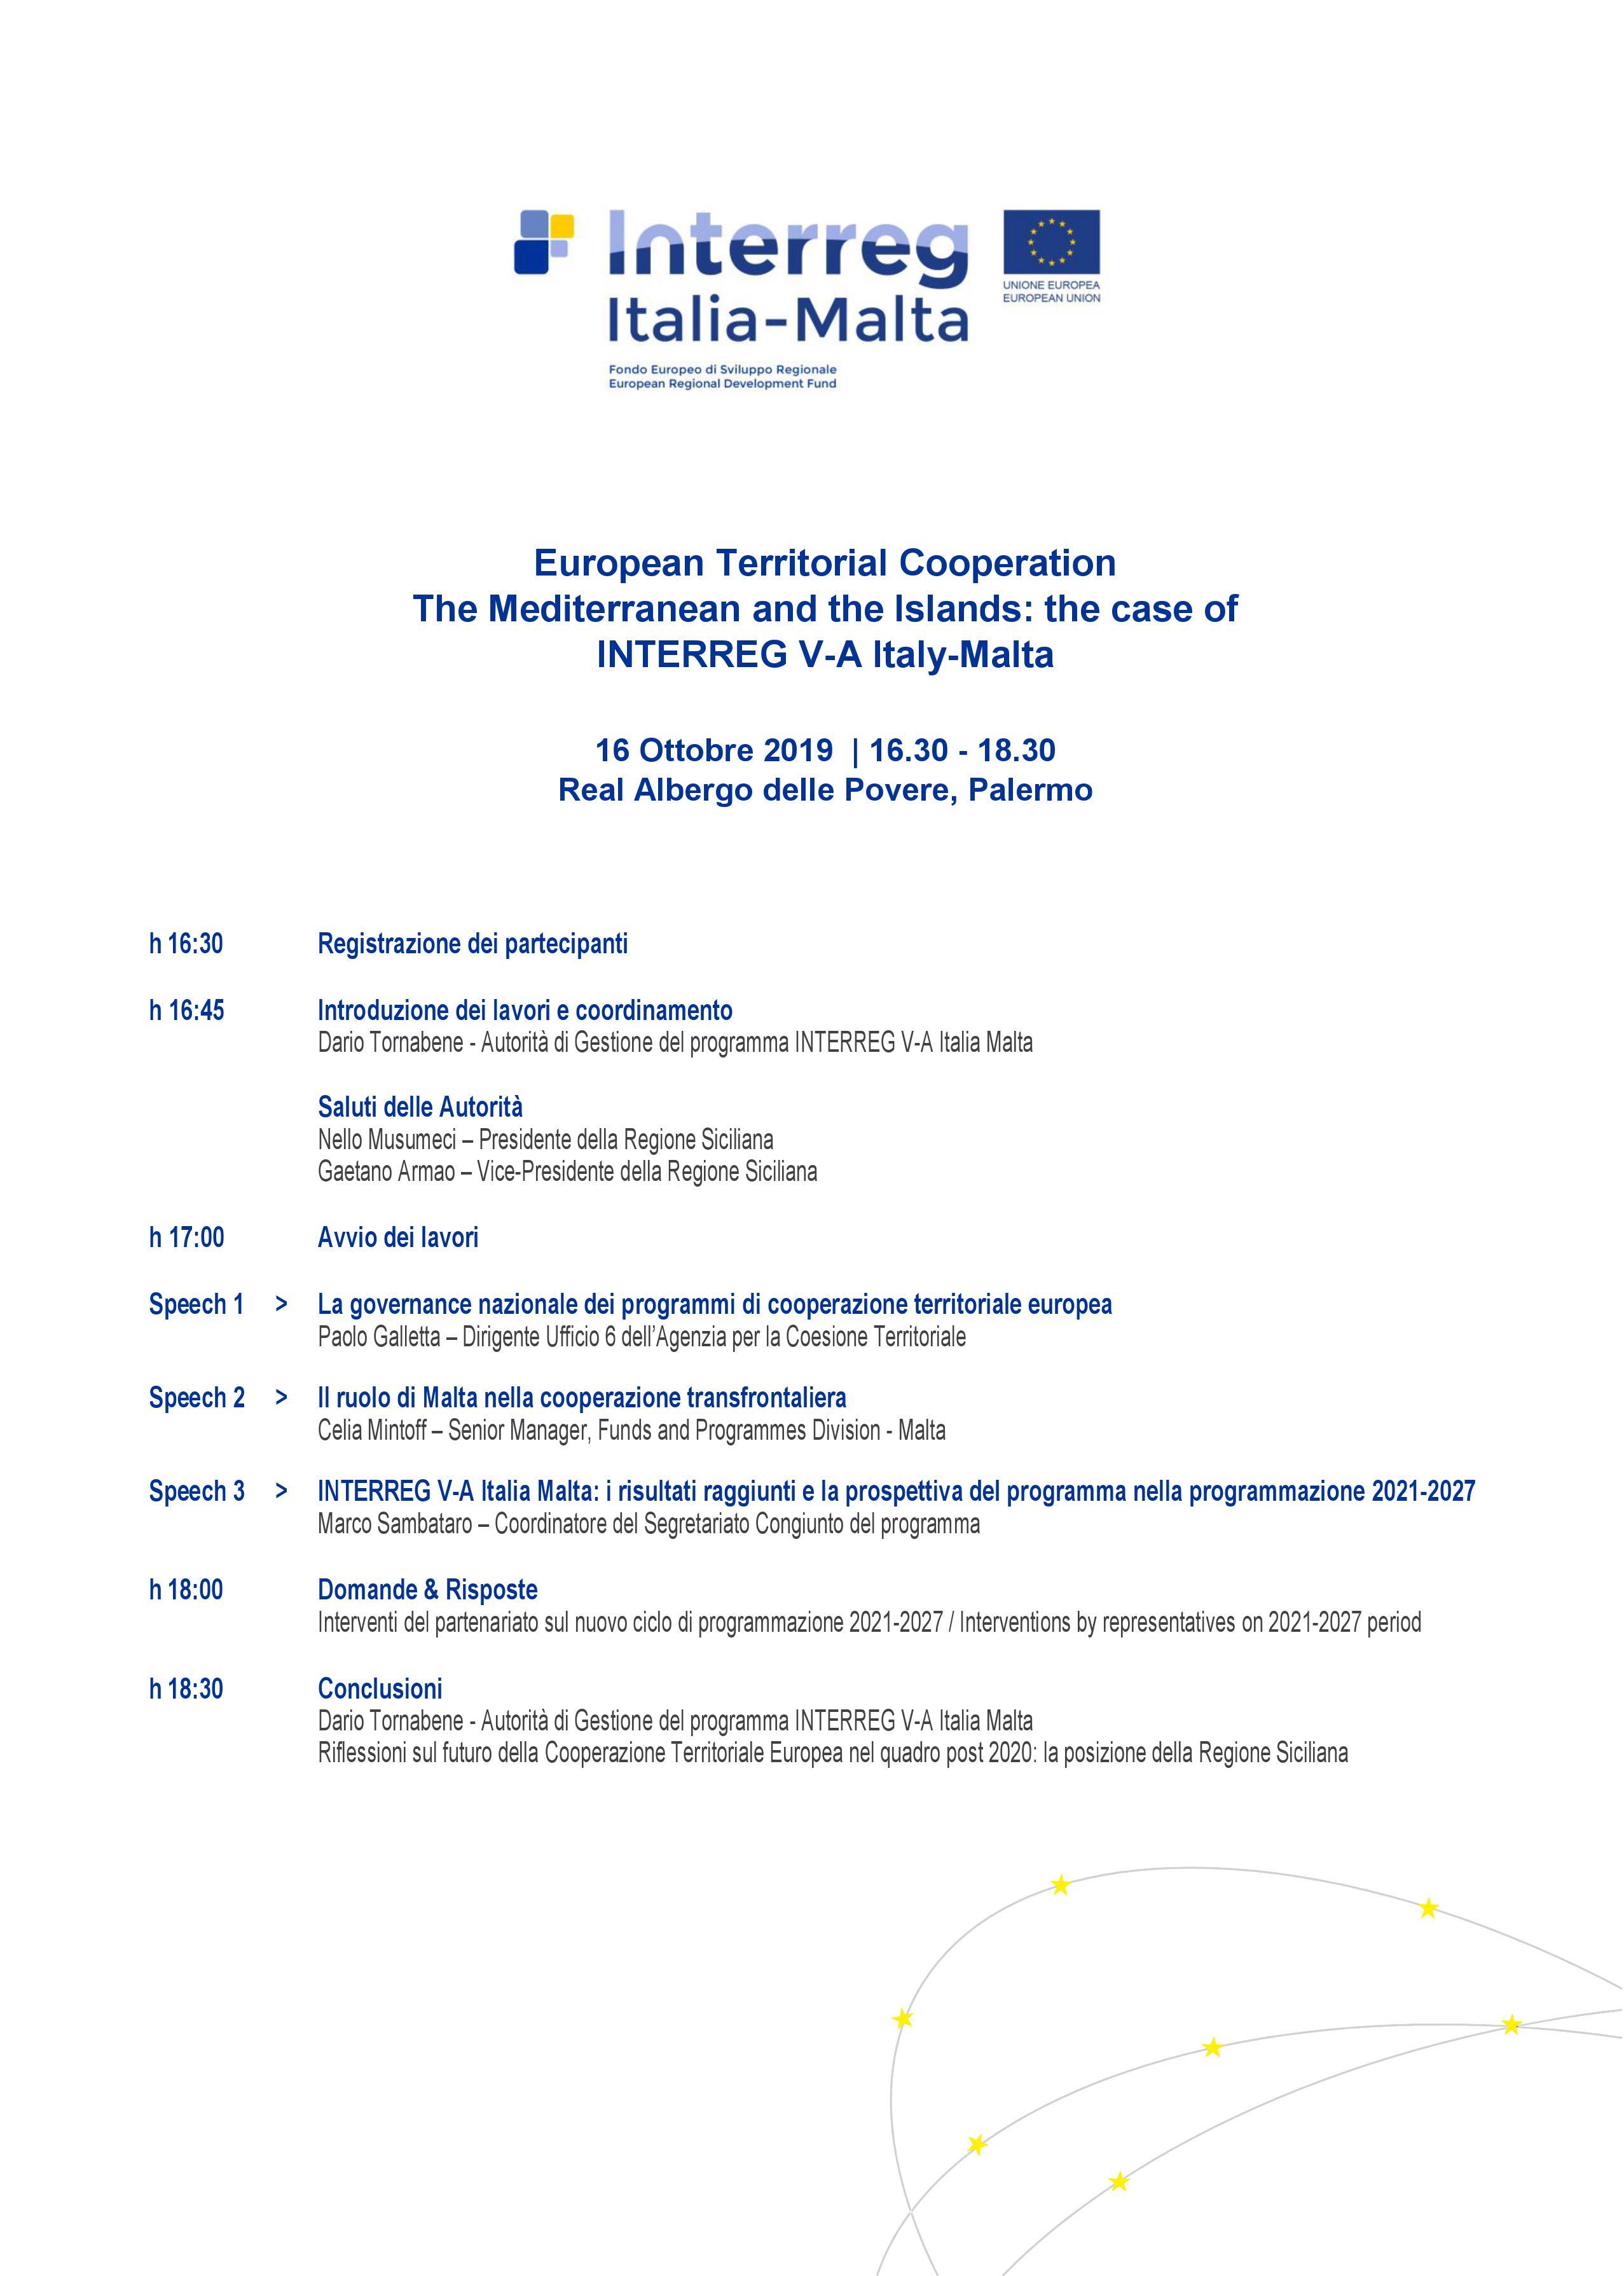 dibattito Italia-malta 16 ottobre 2019